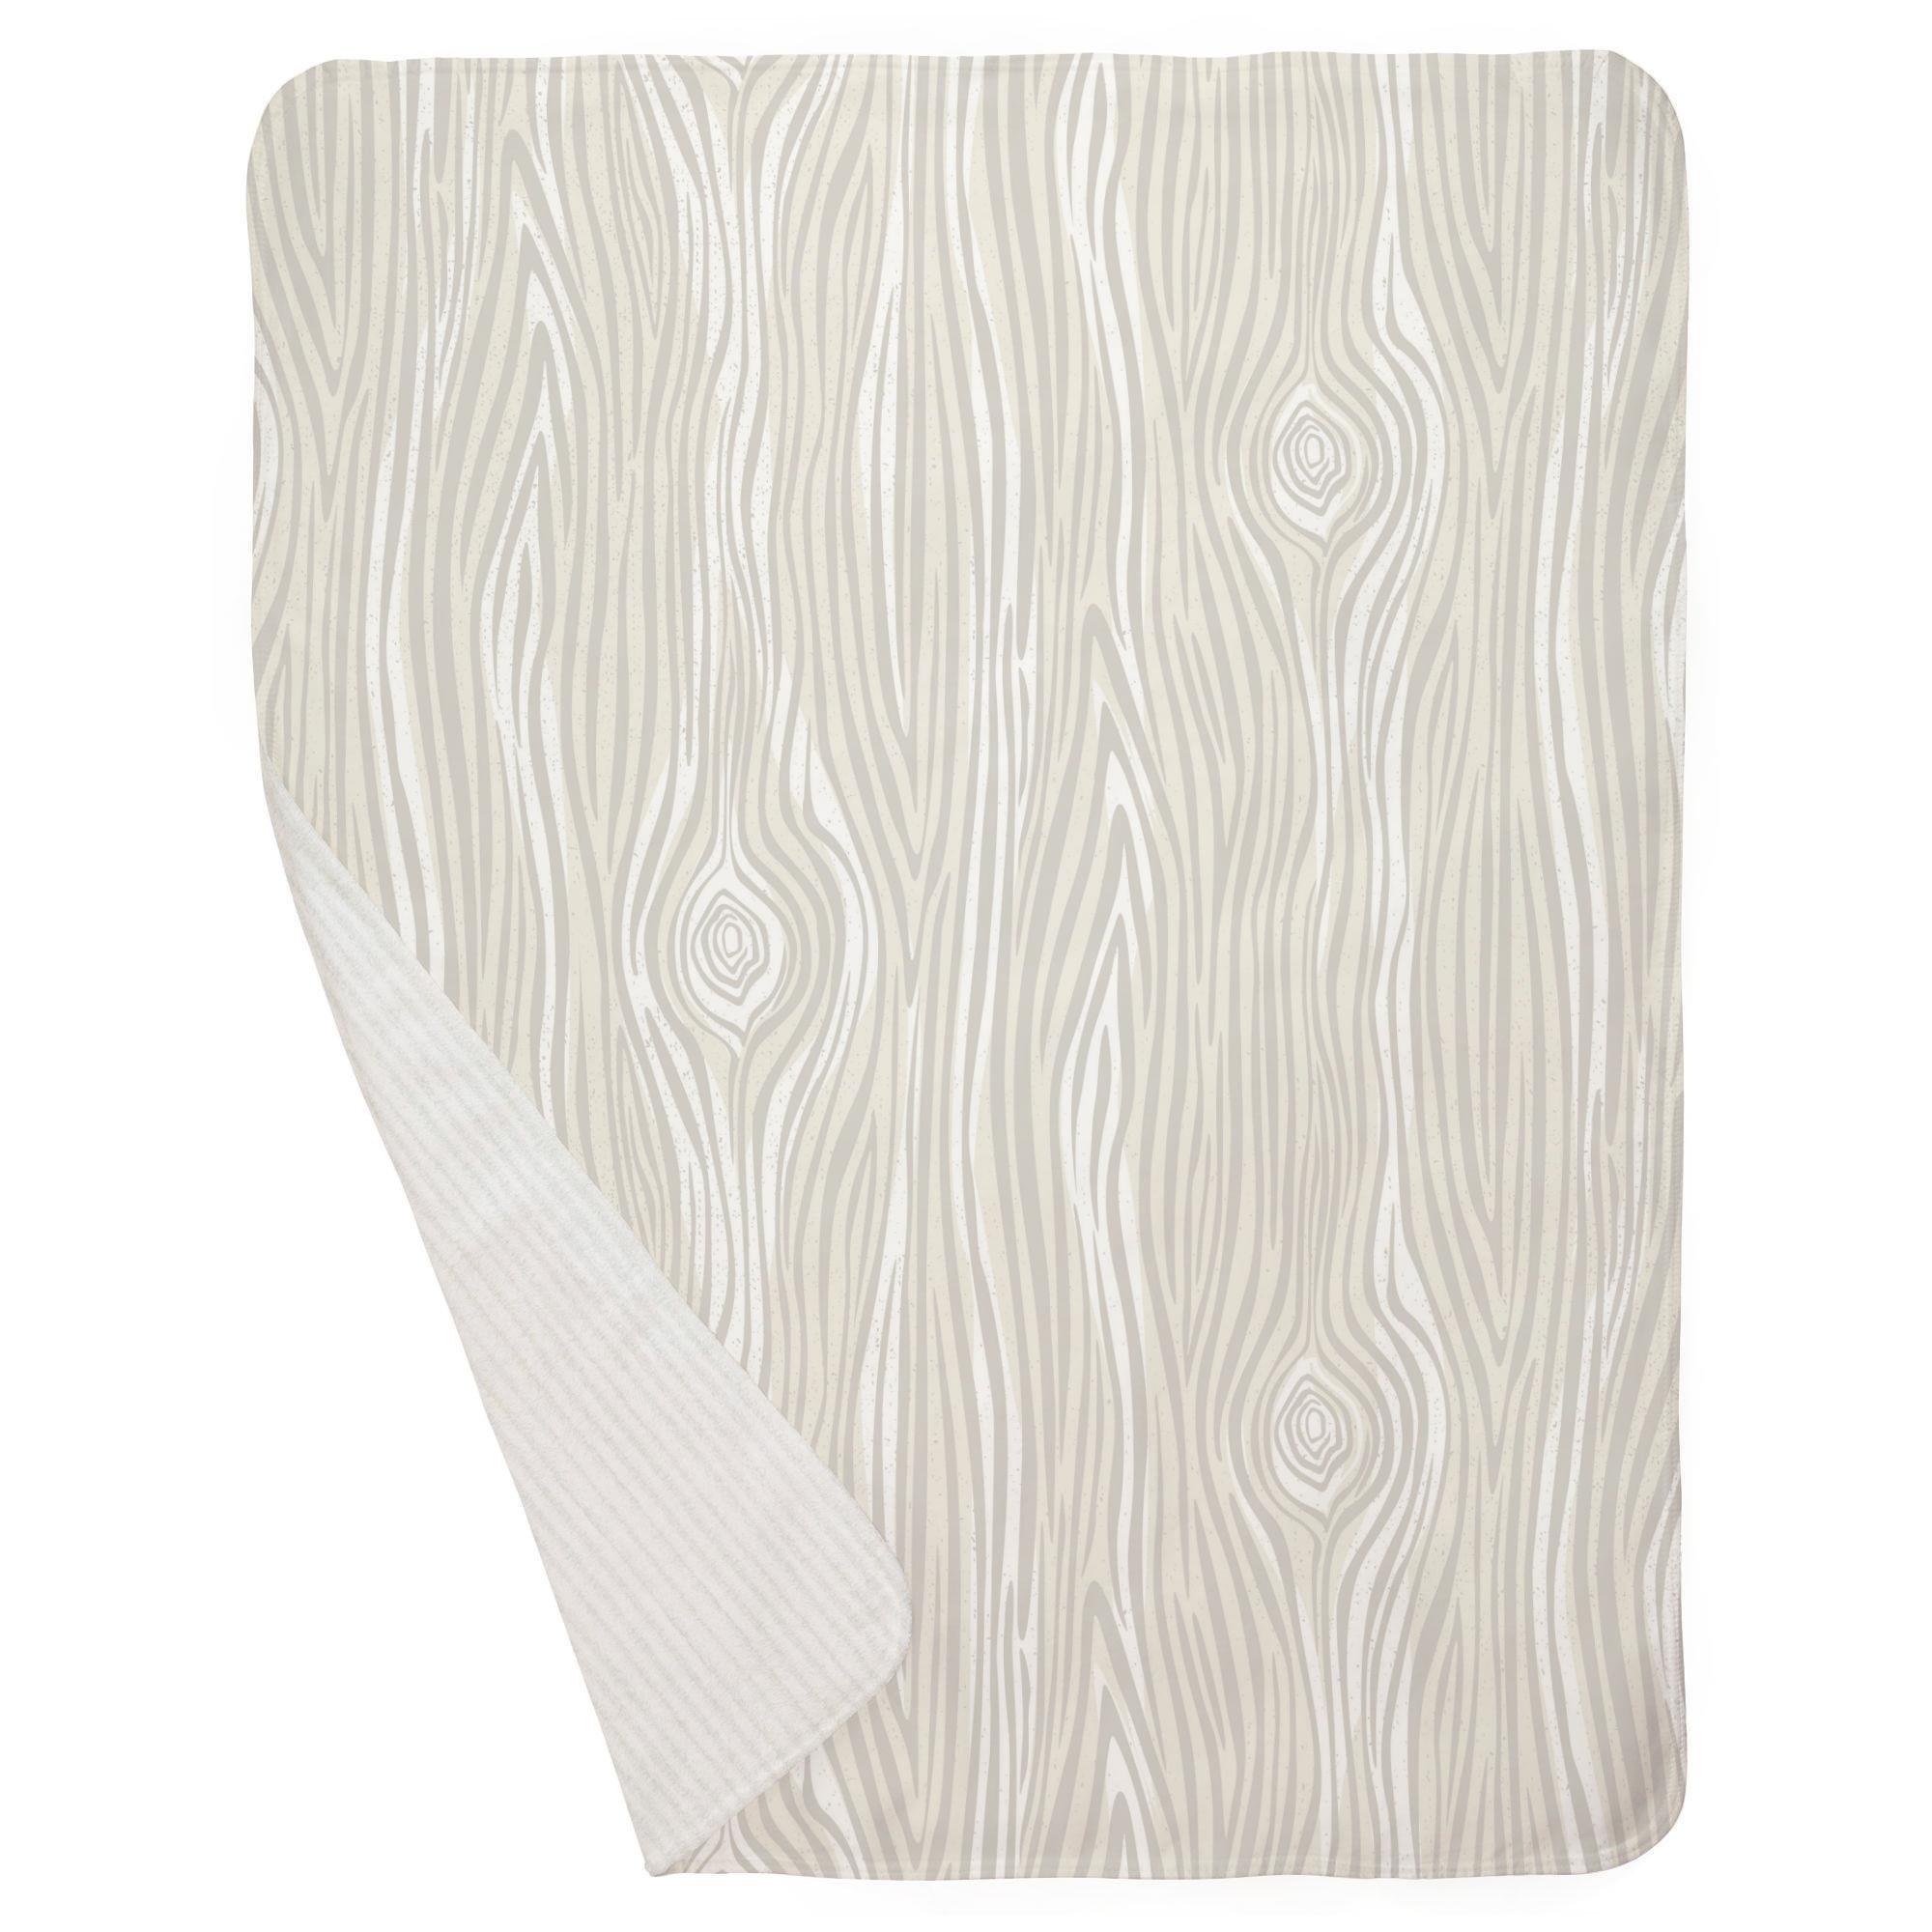 Carousel Designs French Gray Large Woodgrain Mini Crib Blanket by Carousel Designs (Image #3)